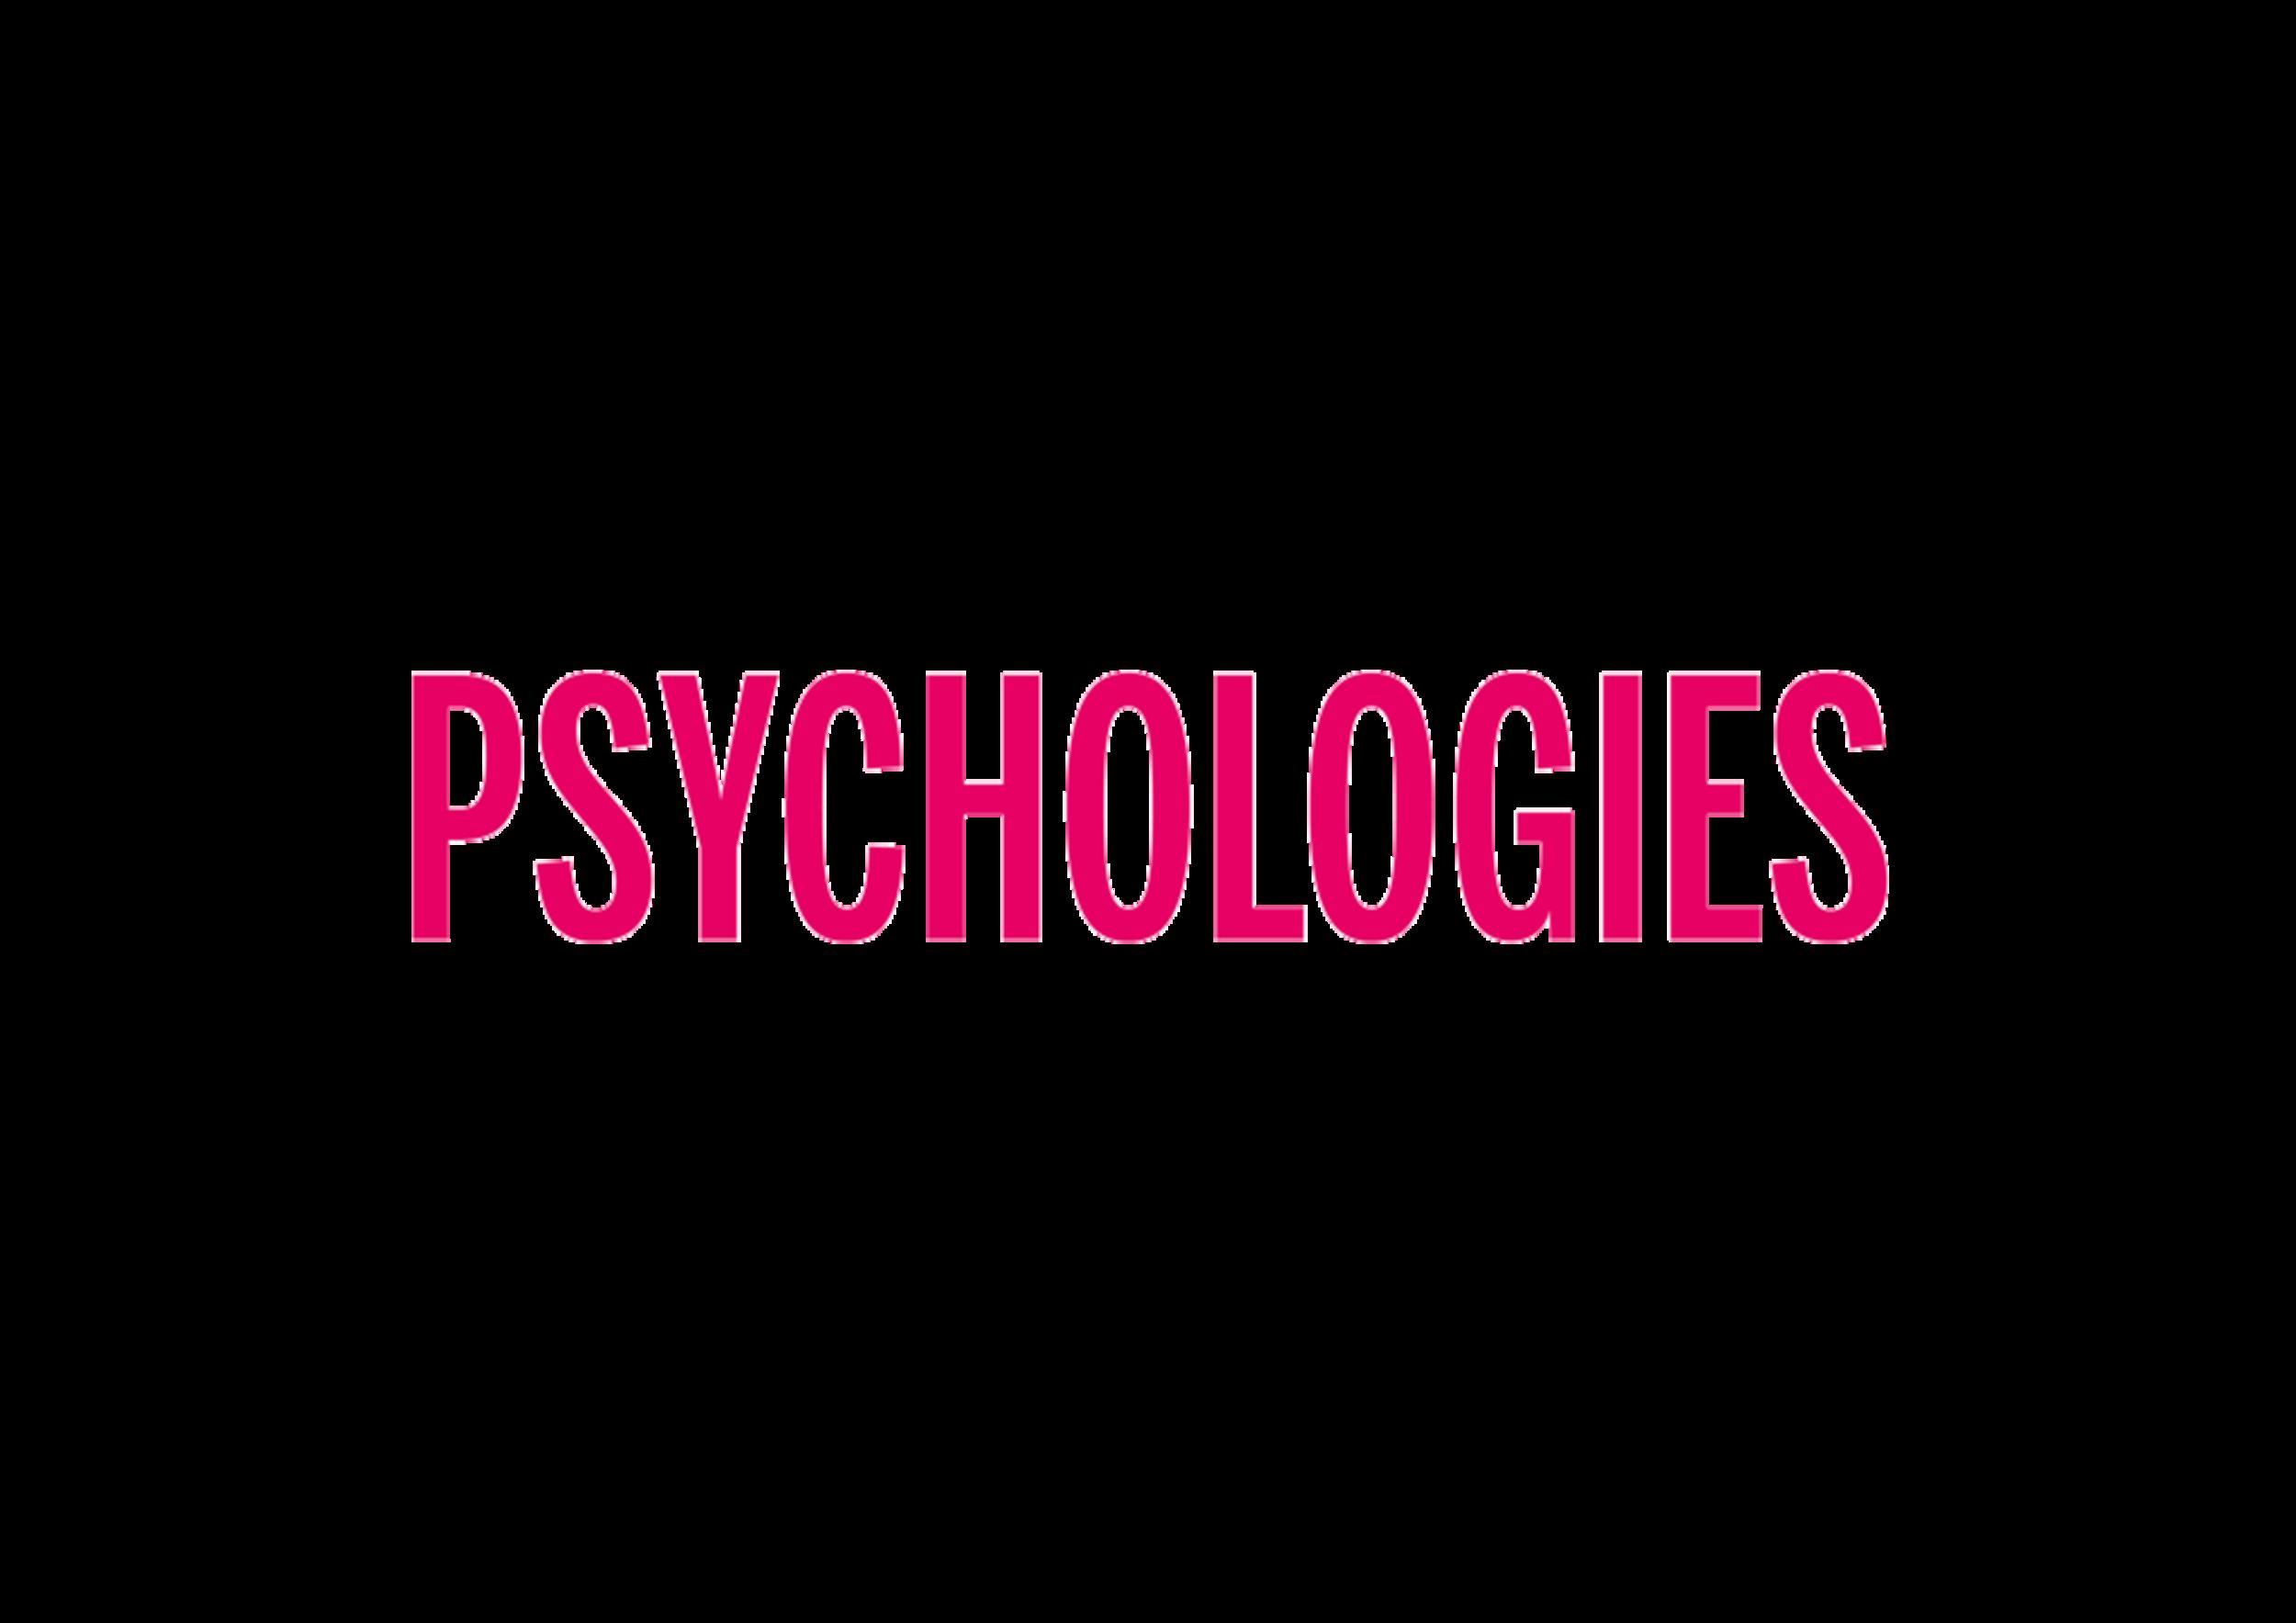 Psychologies.png